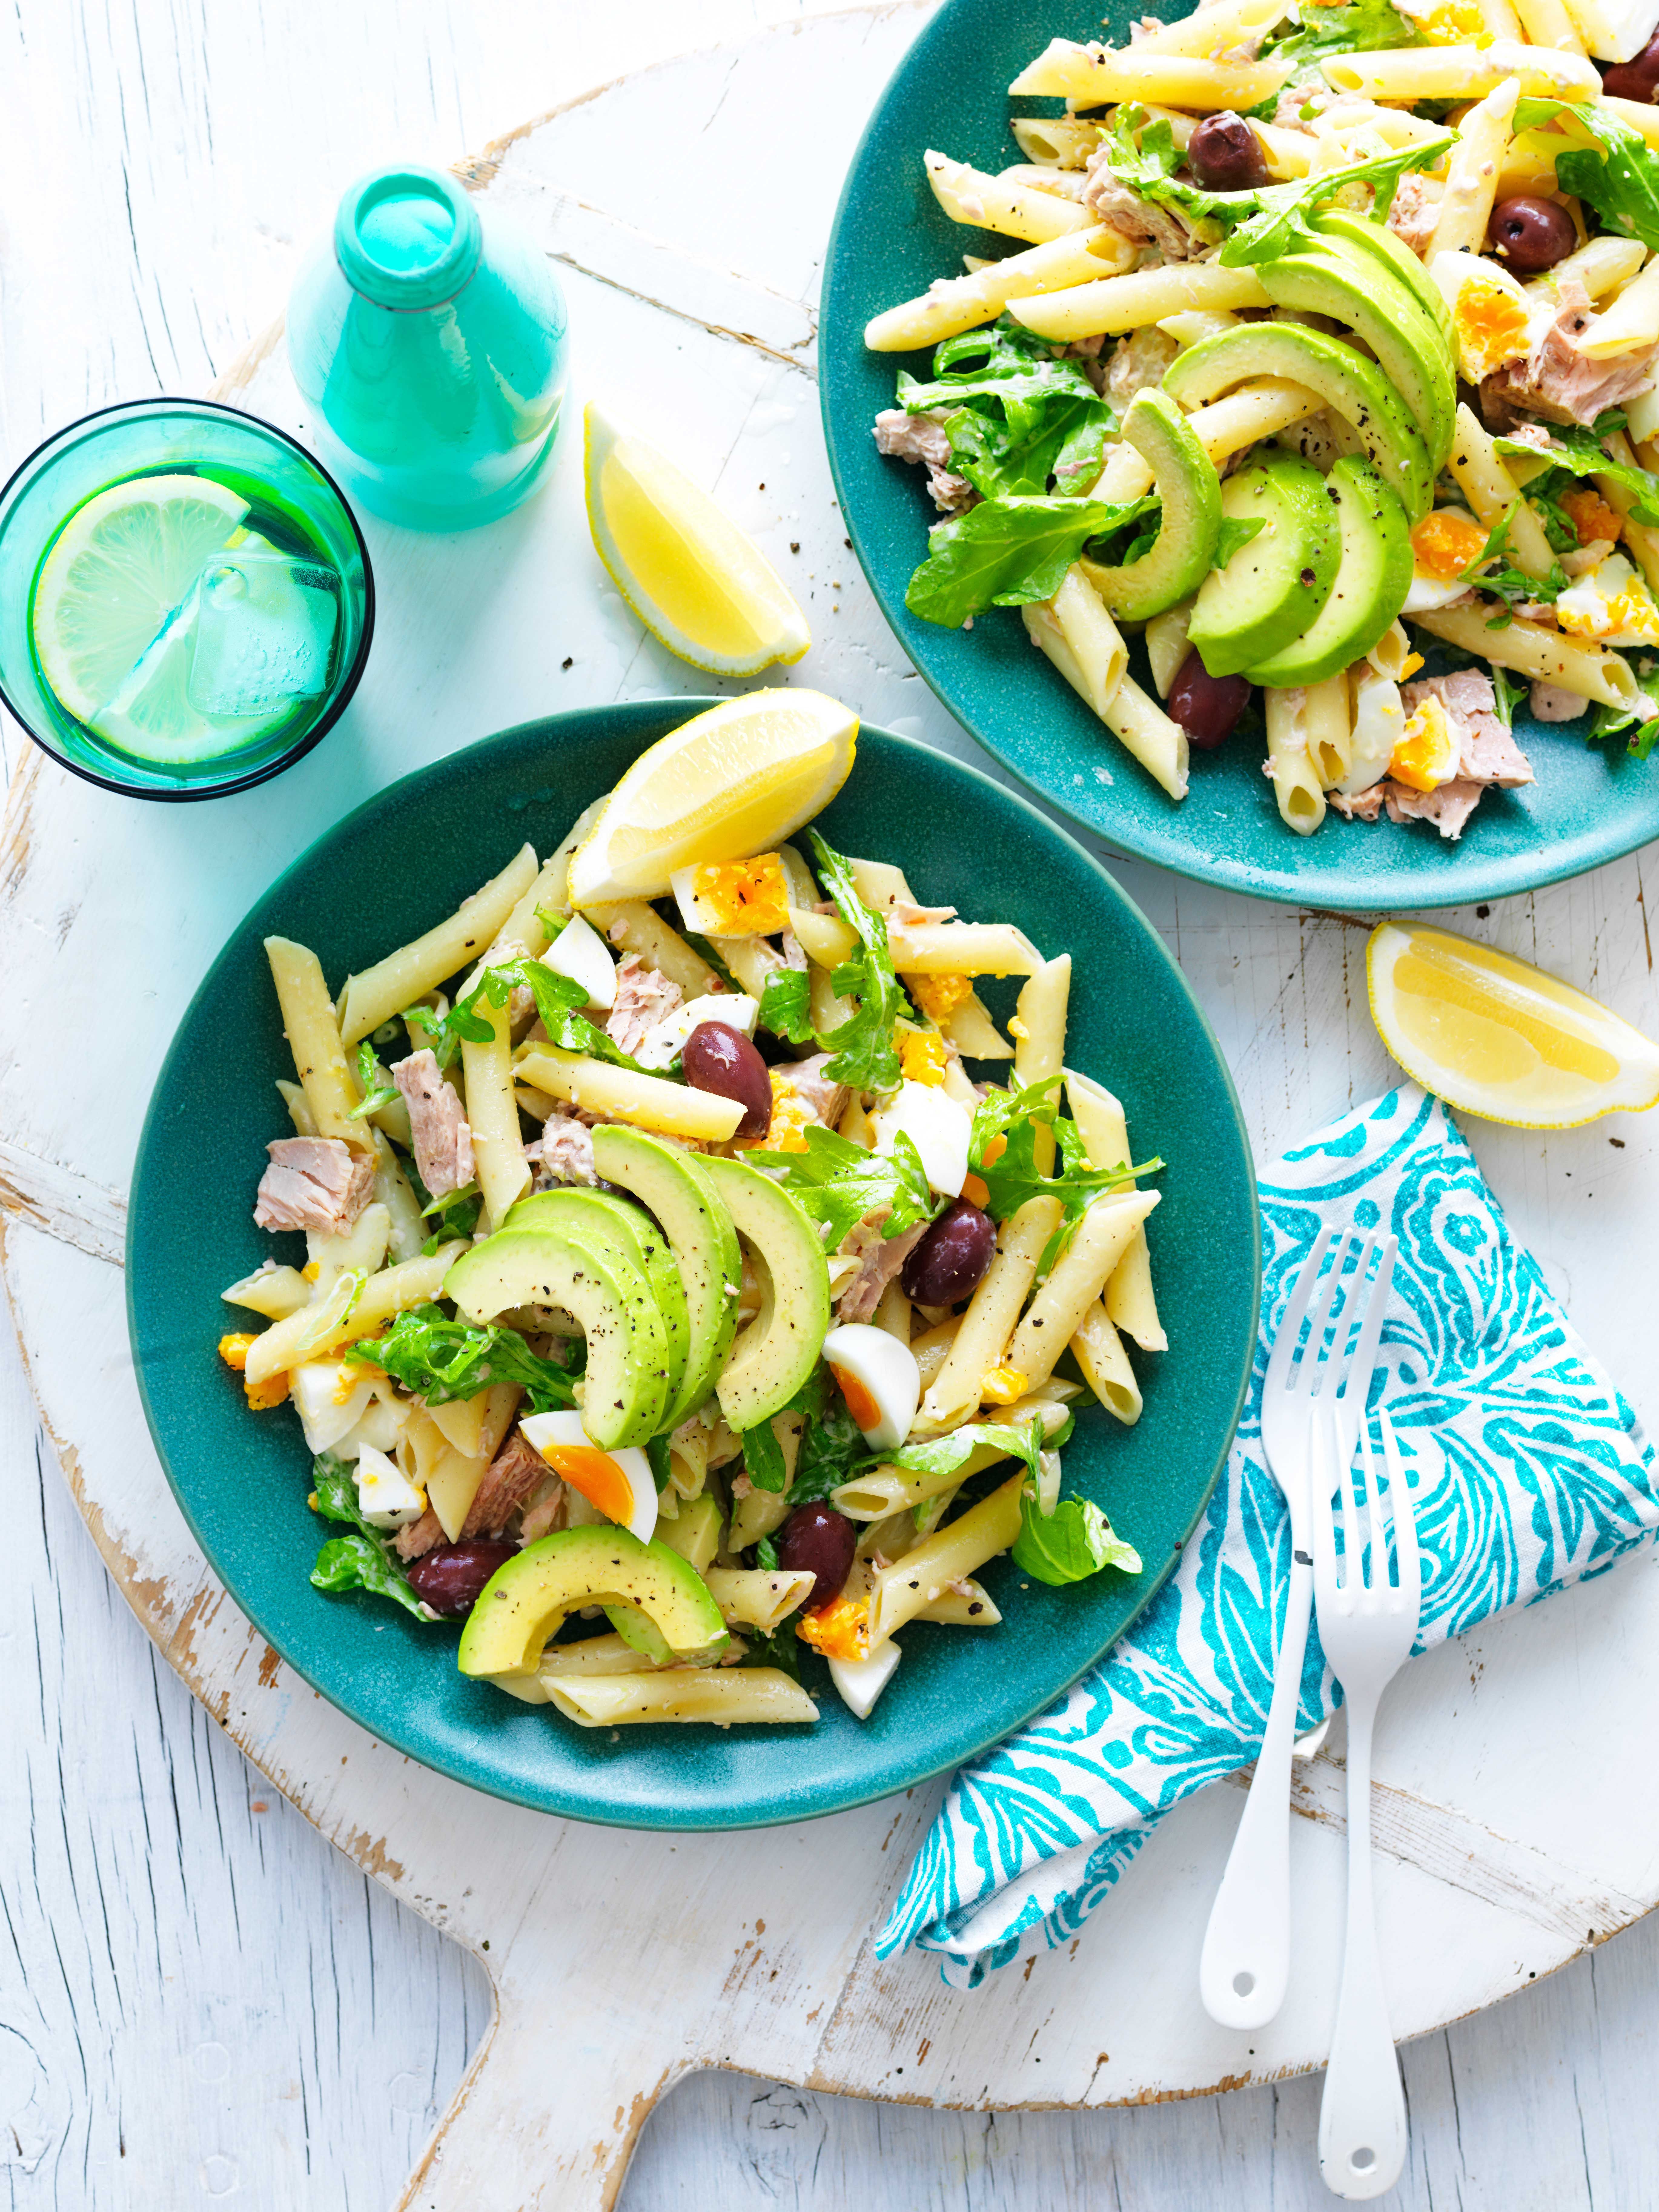 Avocado Tuna Pasta Salad